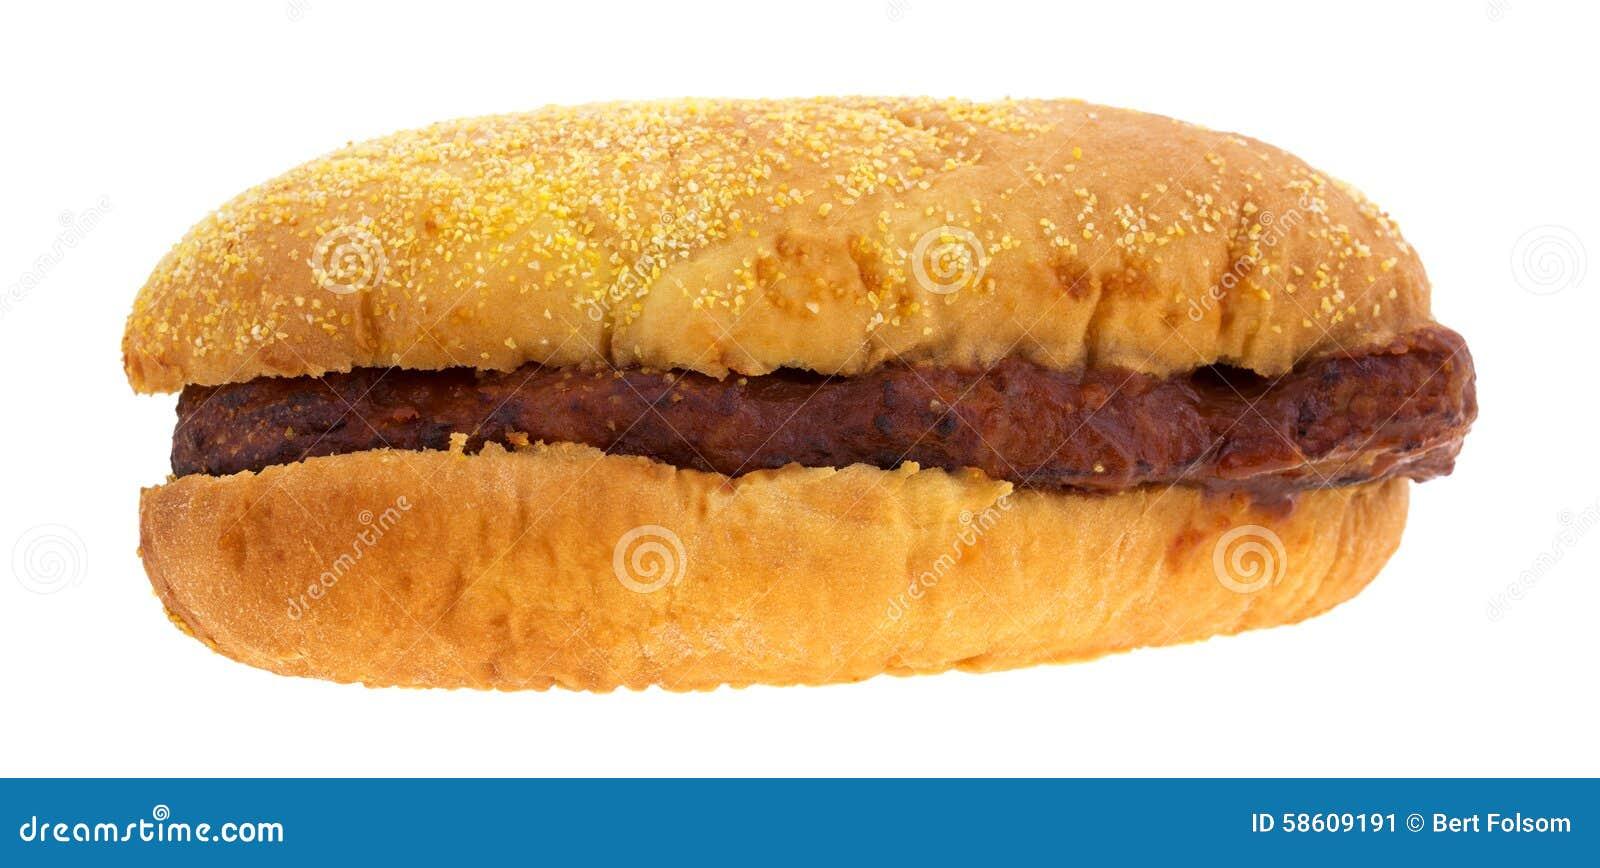 Pork Based Fast Food Sandwich